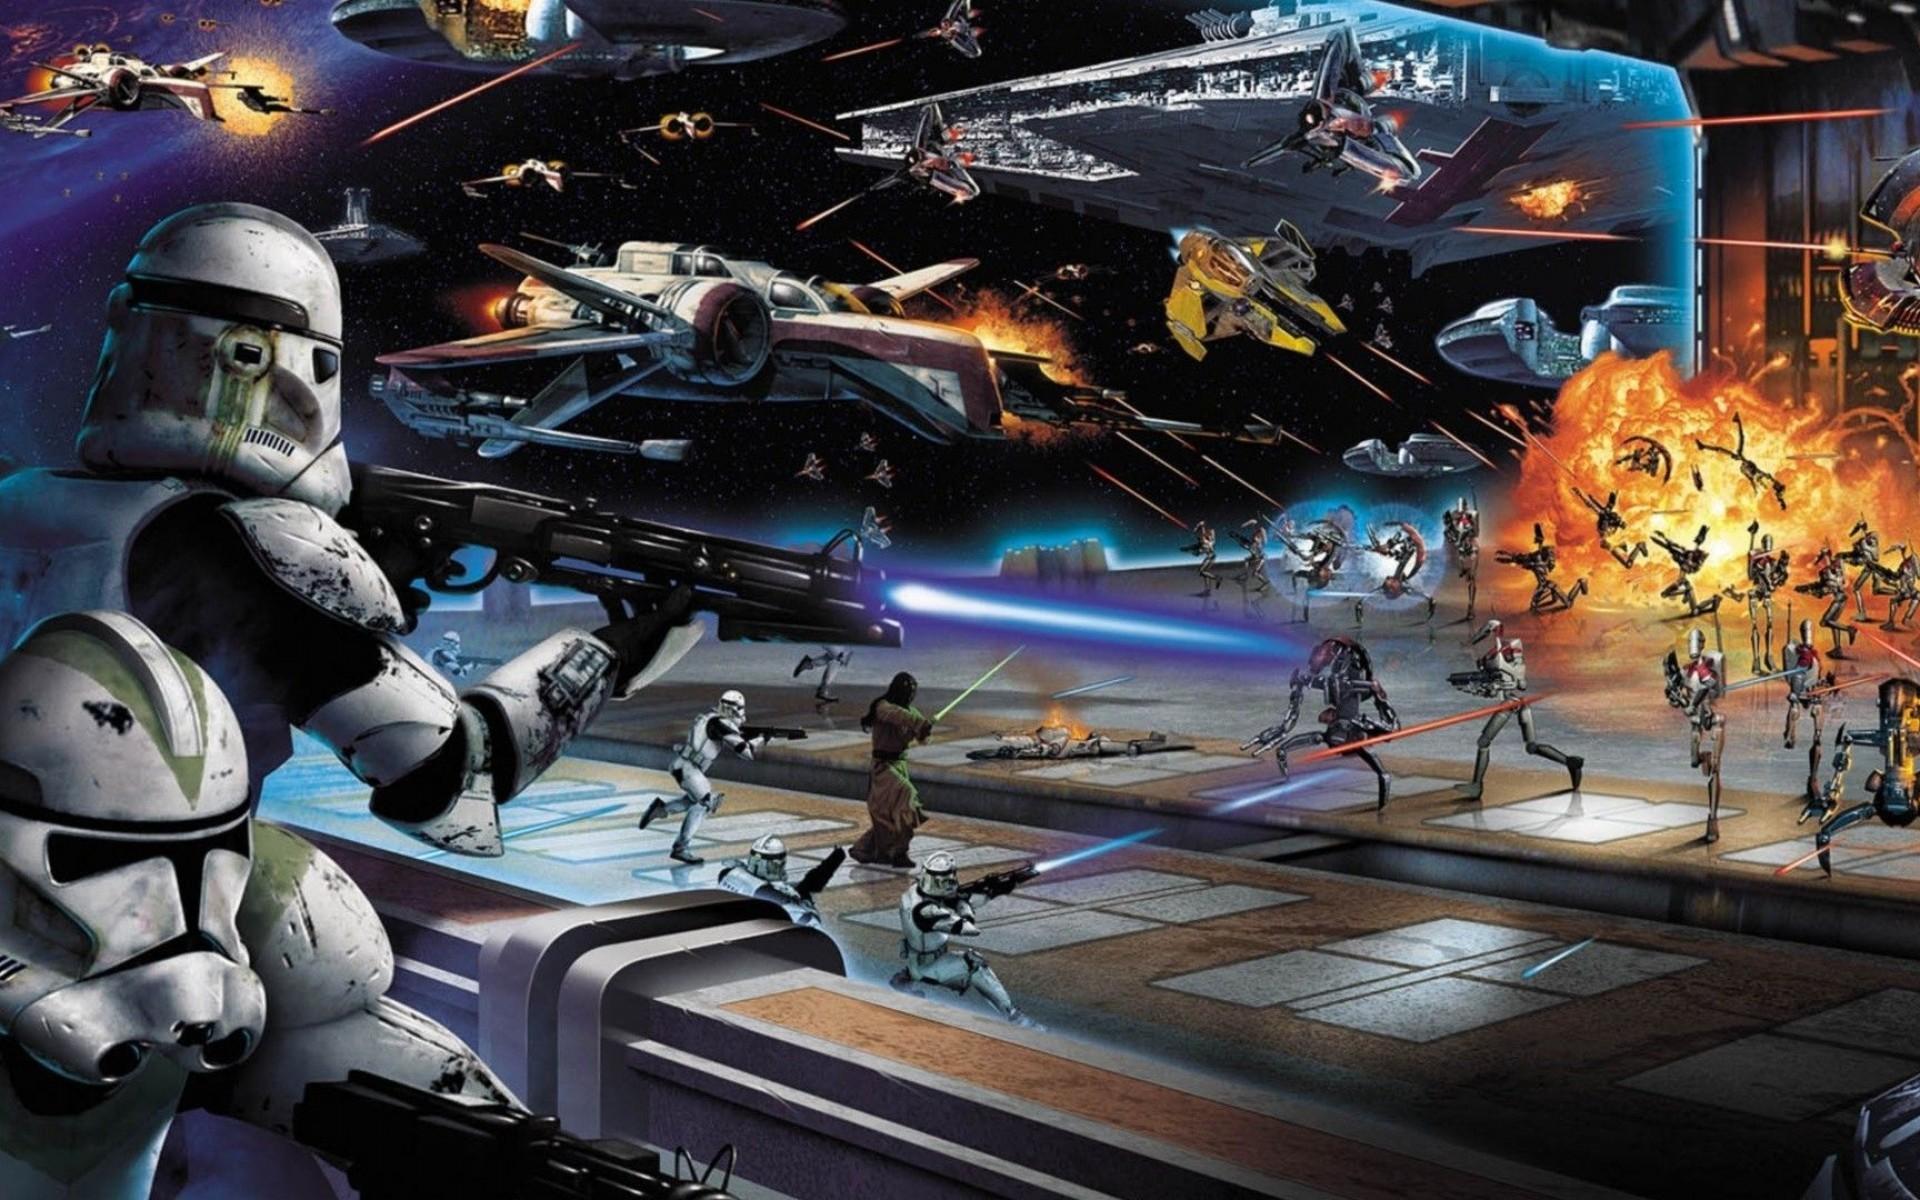 STAR WARS BATTLEFRONT sci-fi warrior battle r wallpaper .